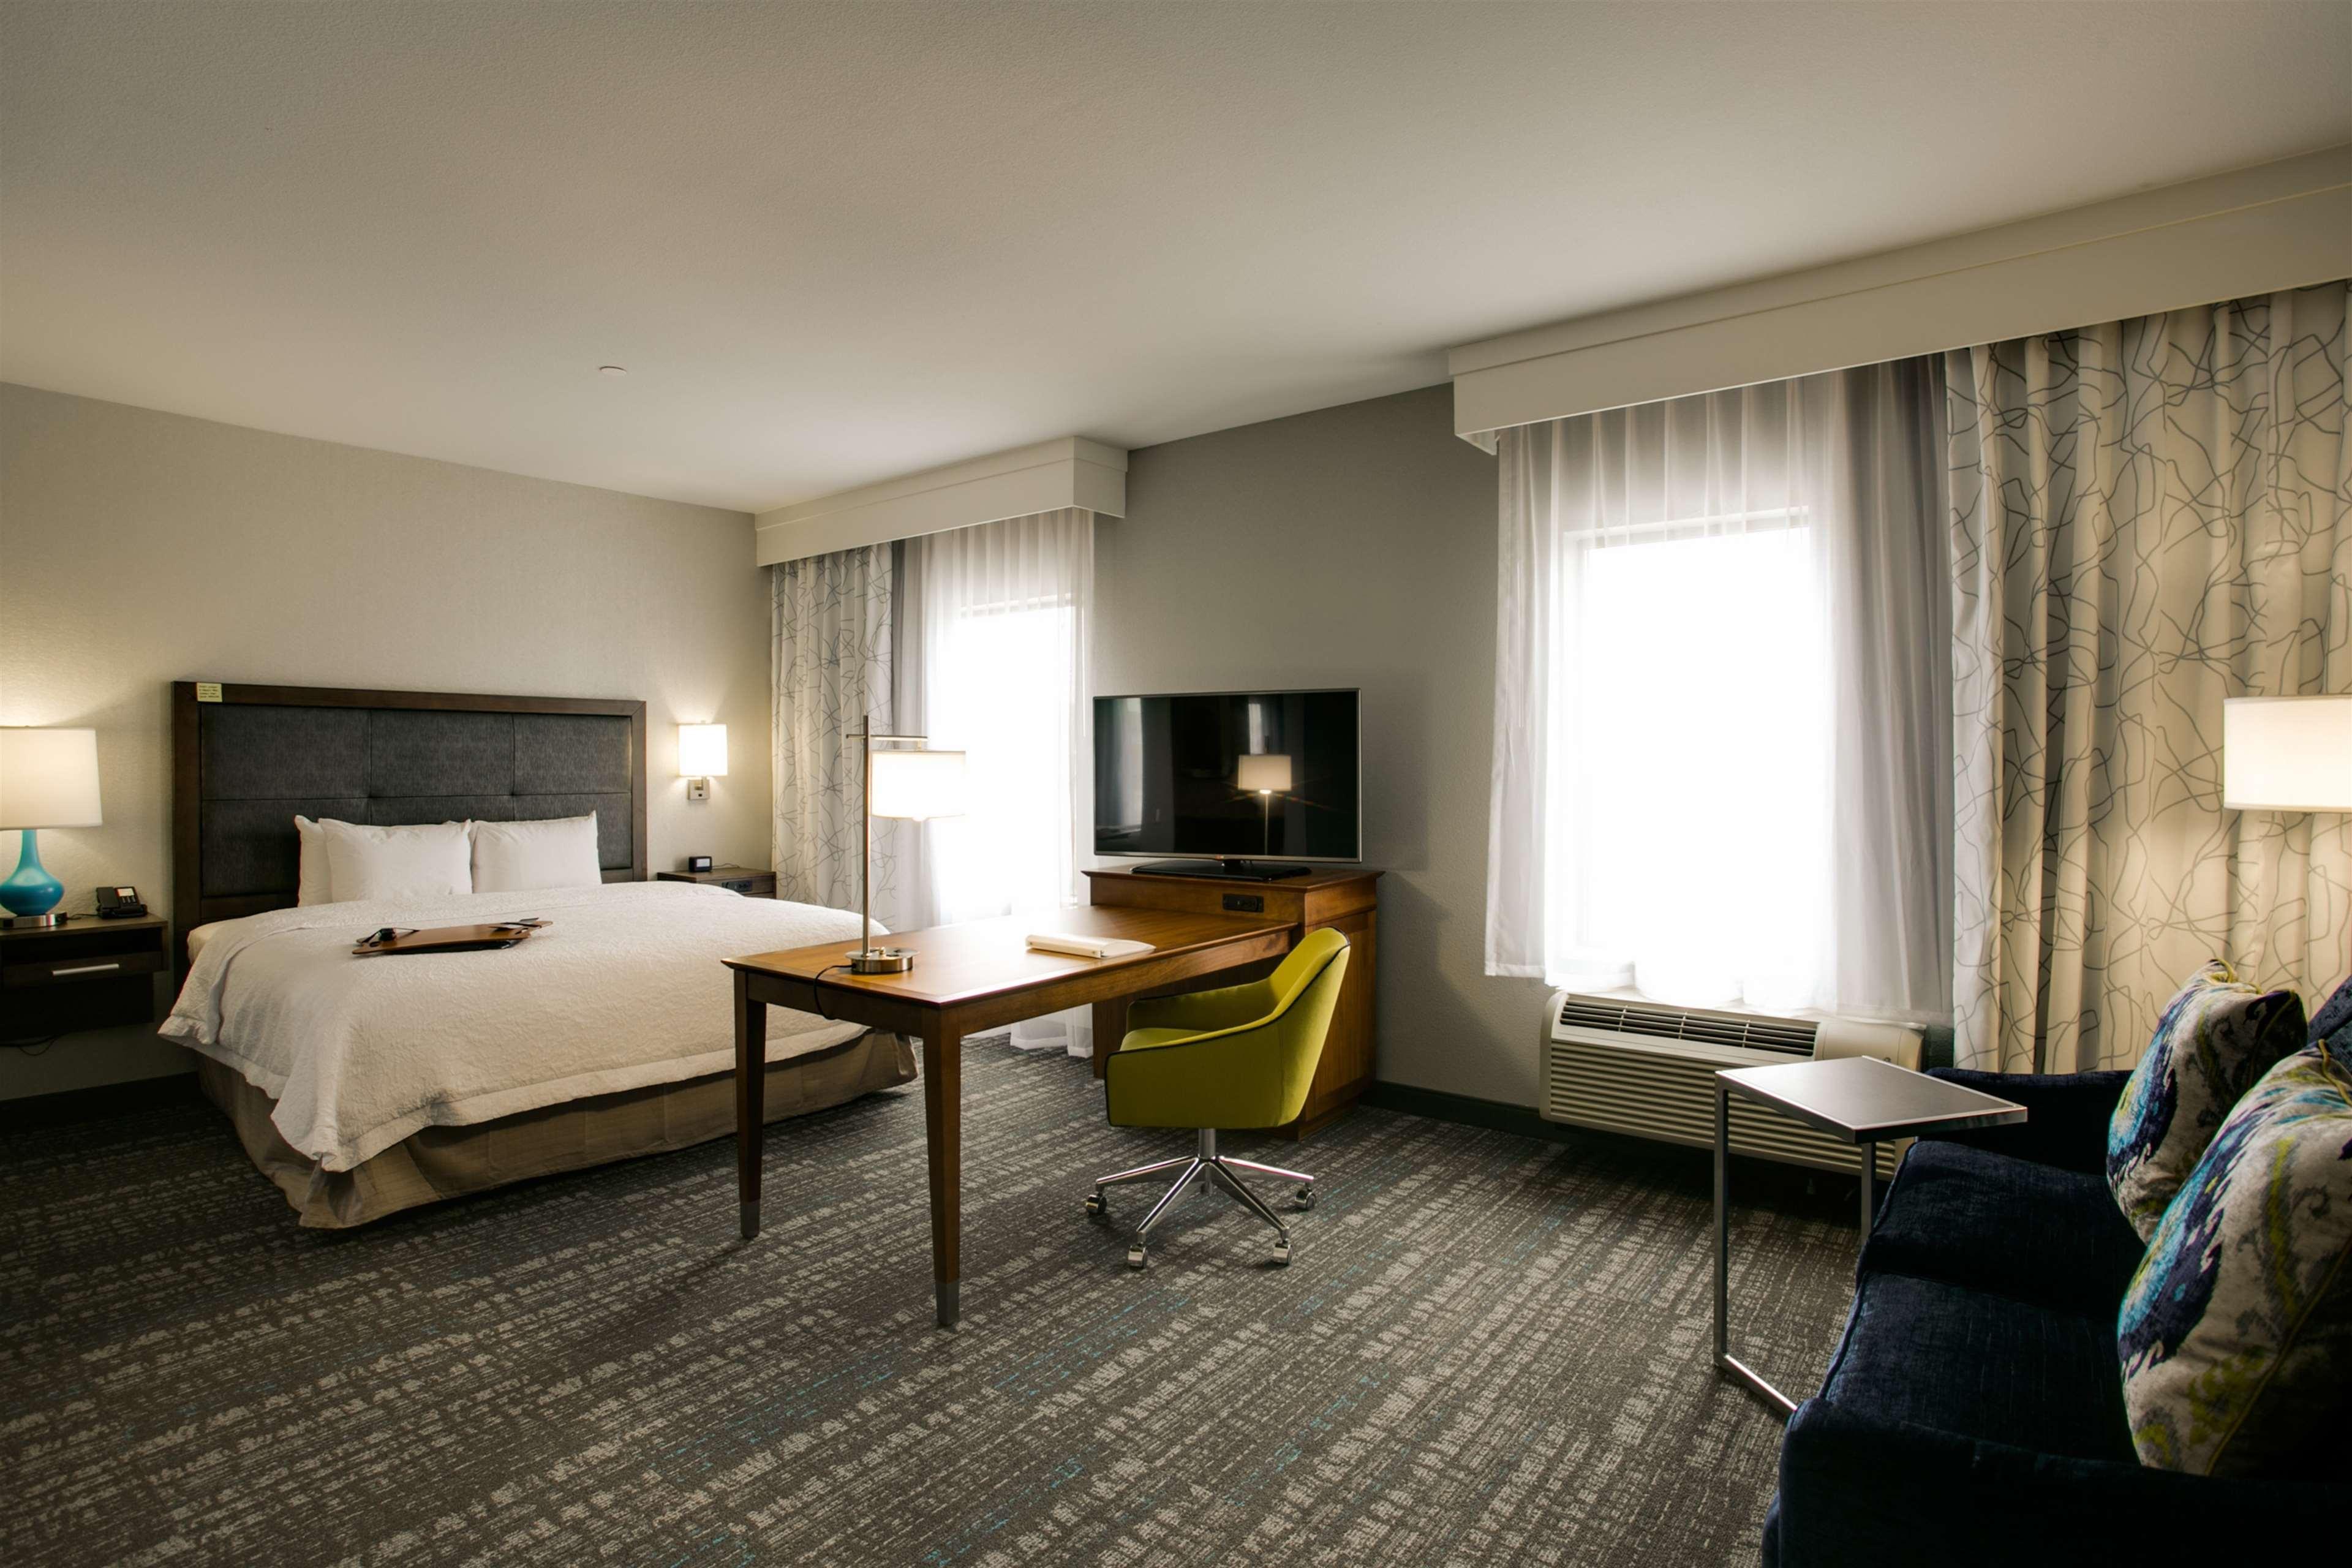 Hampton Inn & Suites Dallas/Ft. Worth Airport South image 23